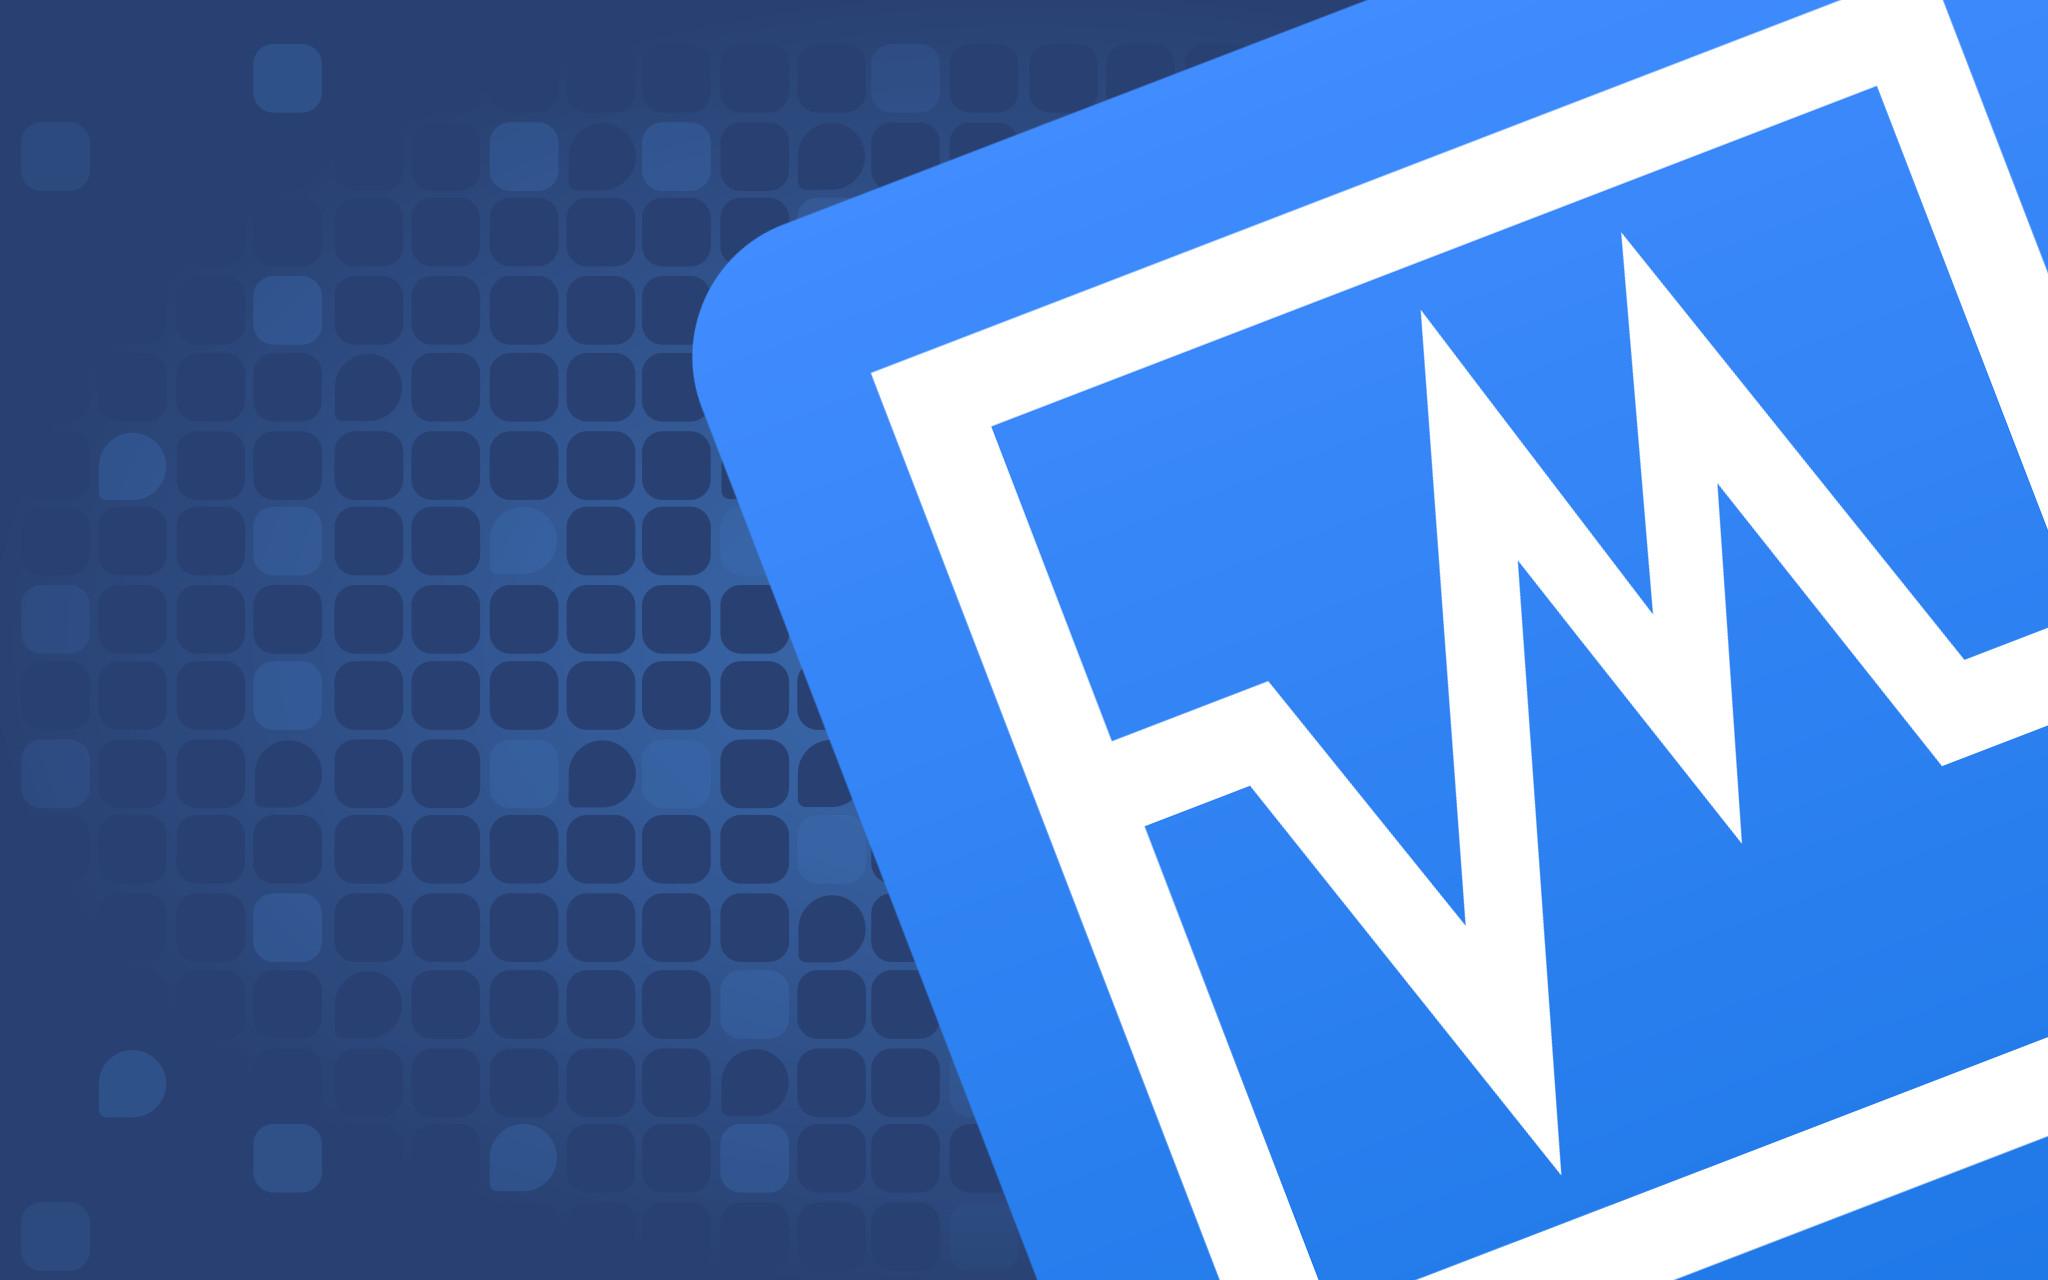 VirtualBox 6.0 Beta 1 | Aperçu rapide